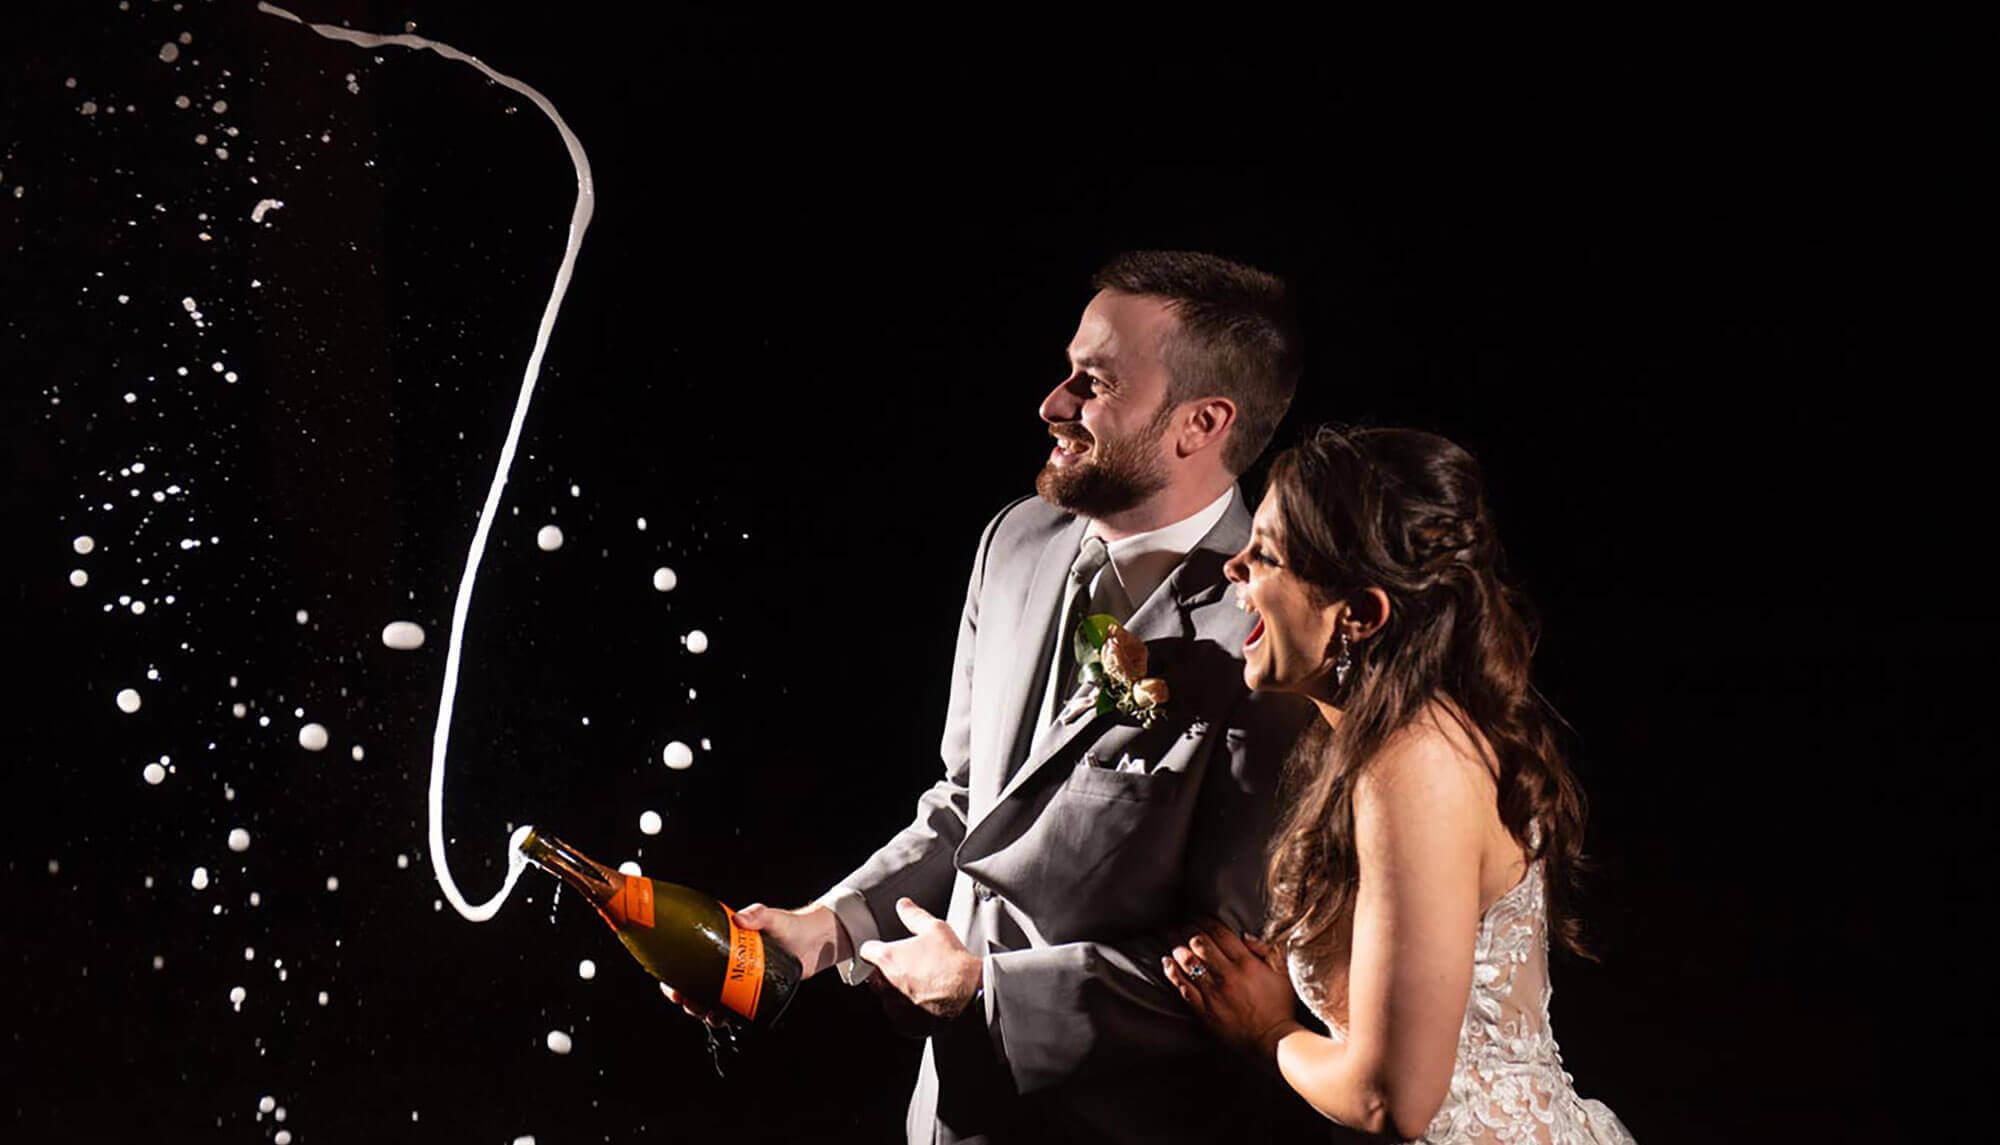 popping champagne wedding celebration northwest arkansas wedding photographer striegler photo